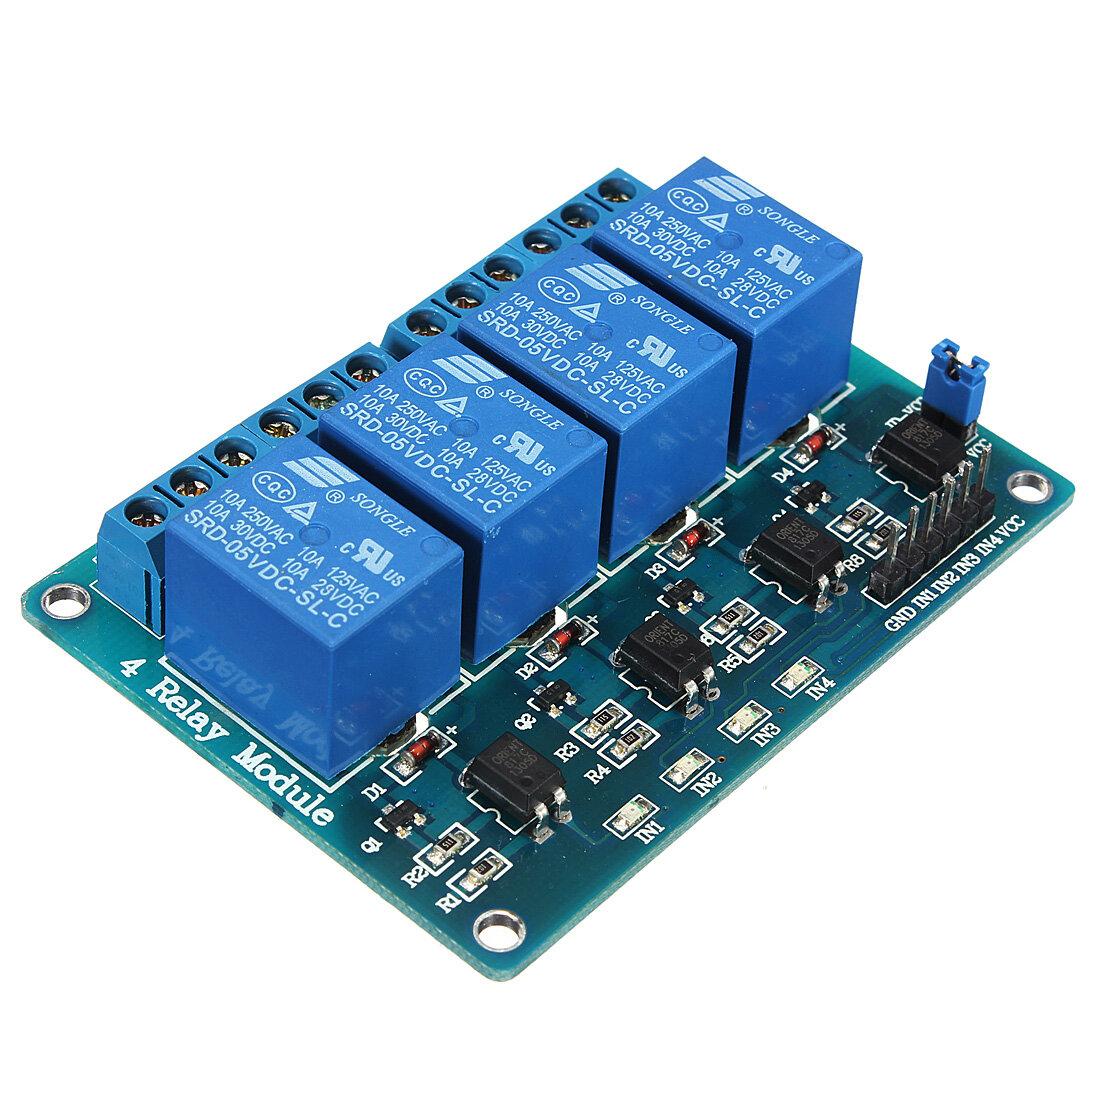 Geekcreit® 5V 4 Channel Relay Module Untuk Arduino PIC ARM DSP AVR MSP430 Biru